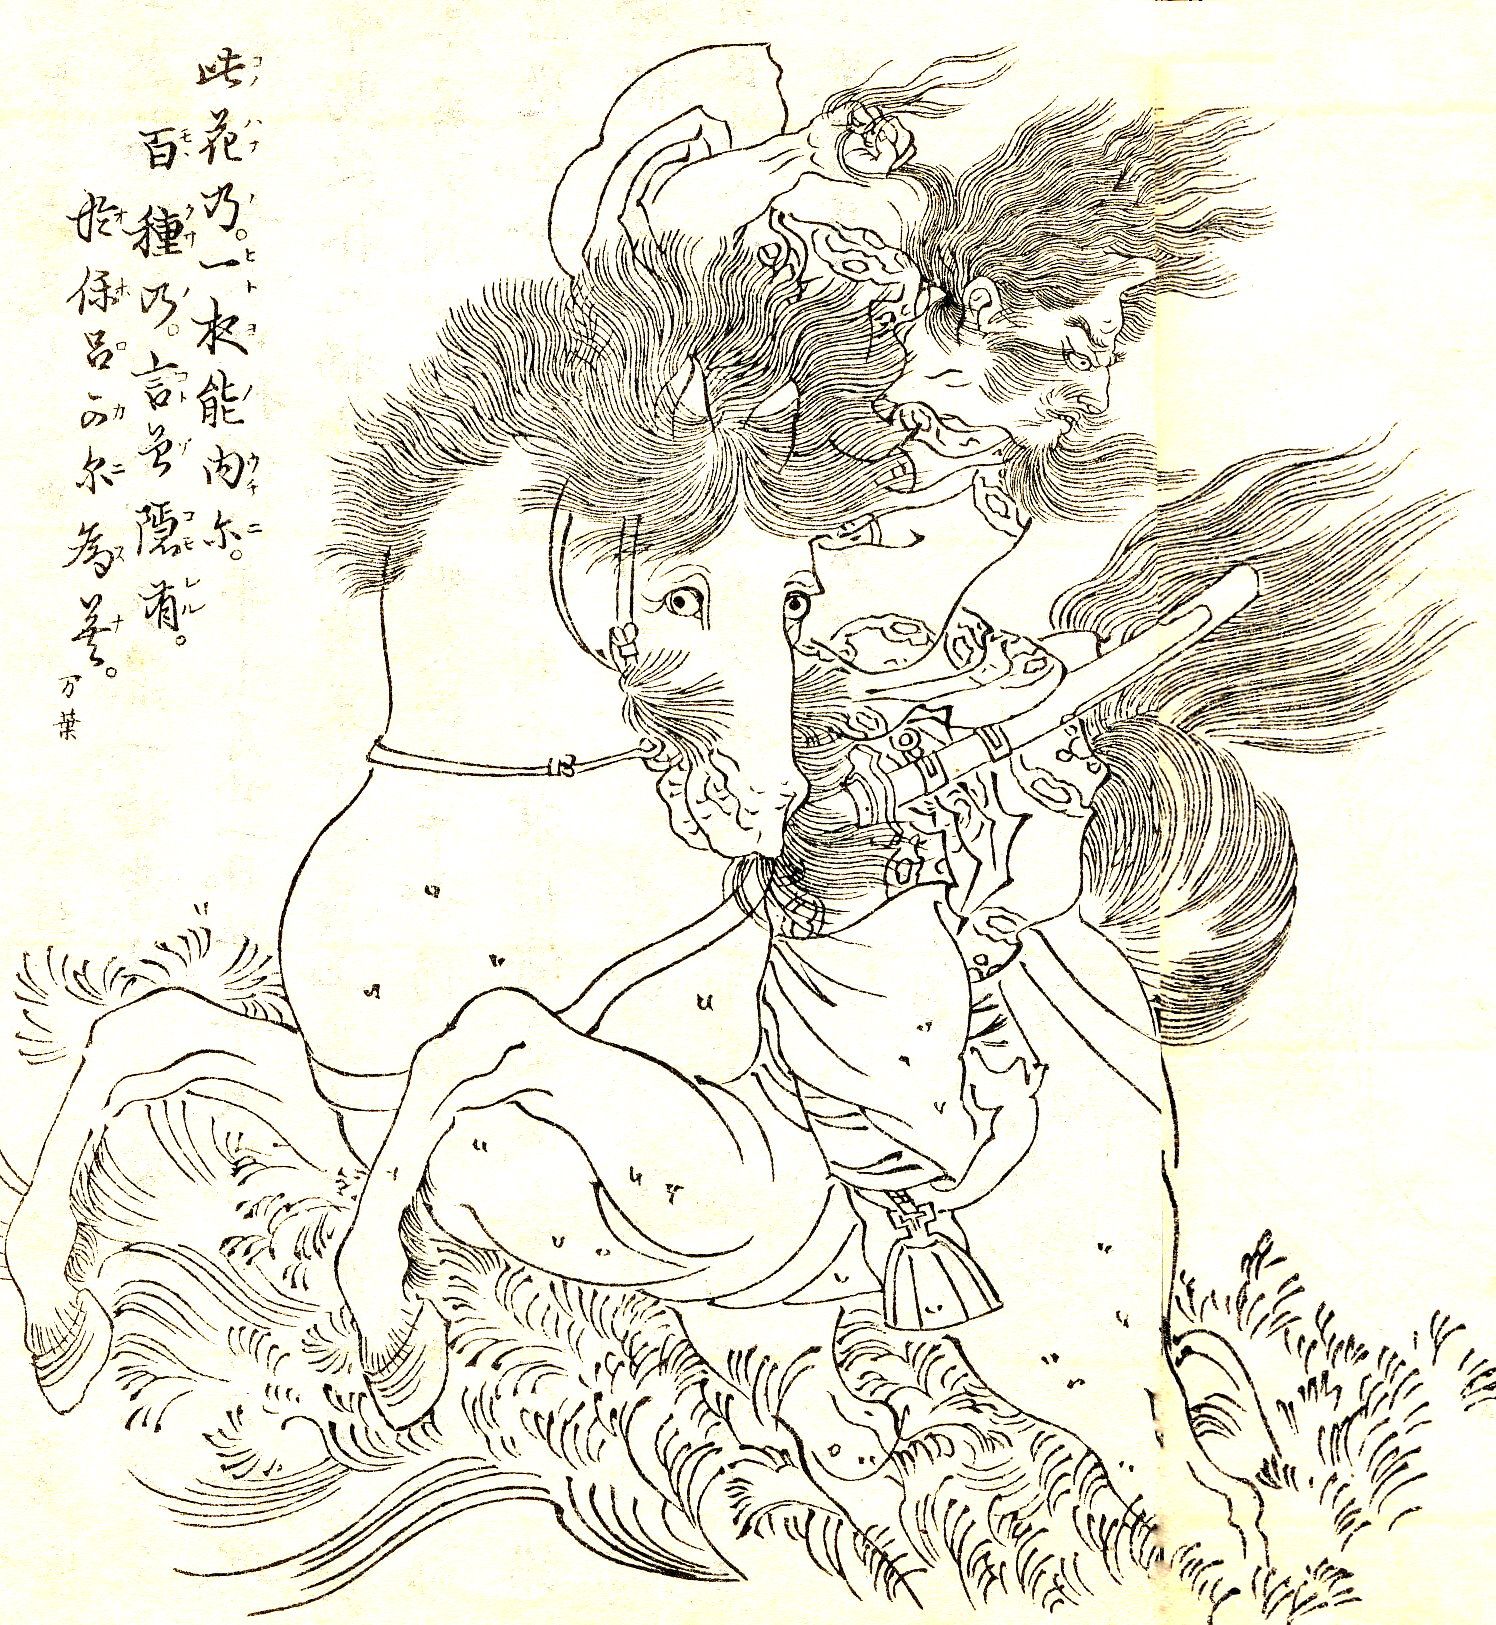 Фудзивара-но Хироцугу, как изображен на гравюре периода Мэйдзи